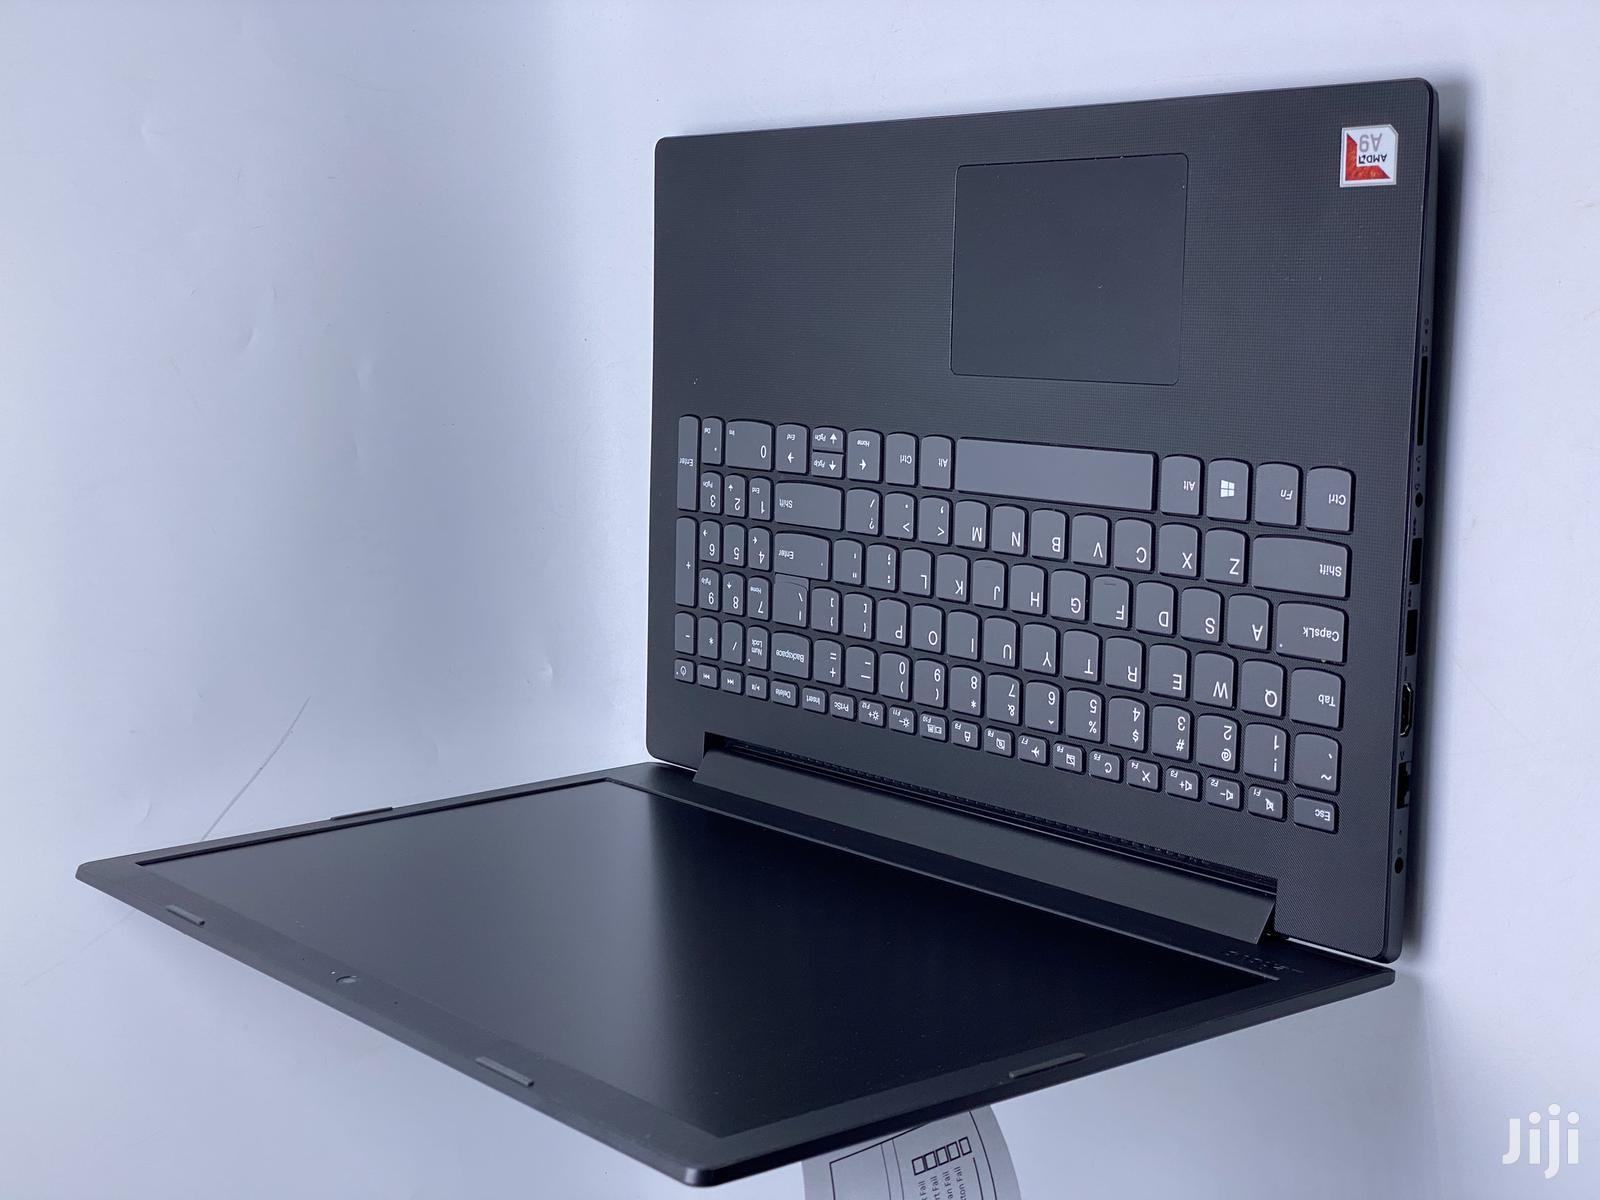 Laptop Lenovo Flex 6 4GB AMD SSD 128GB | Laptops & Computers for sale in Dzorwulu, Greater Accra, Ghana